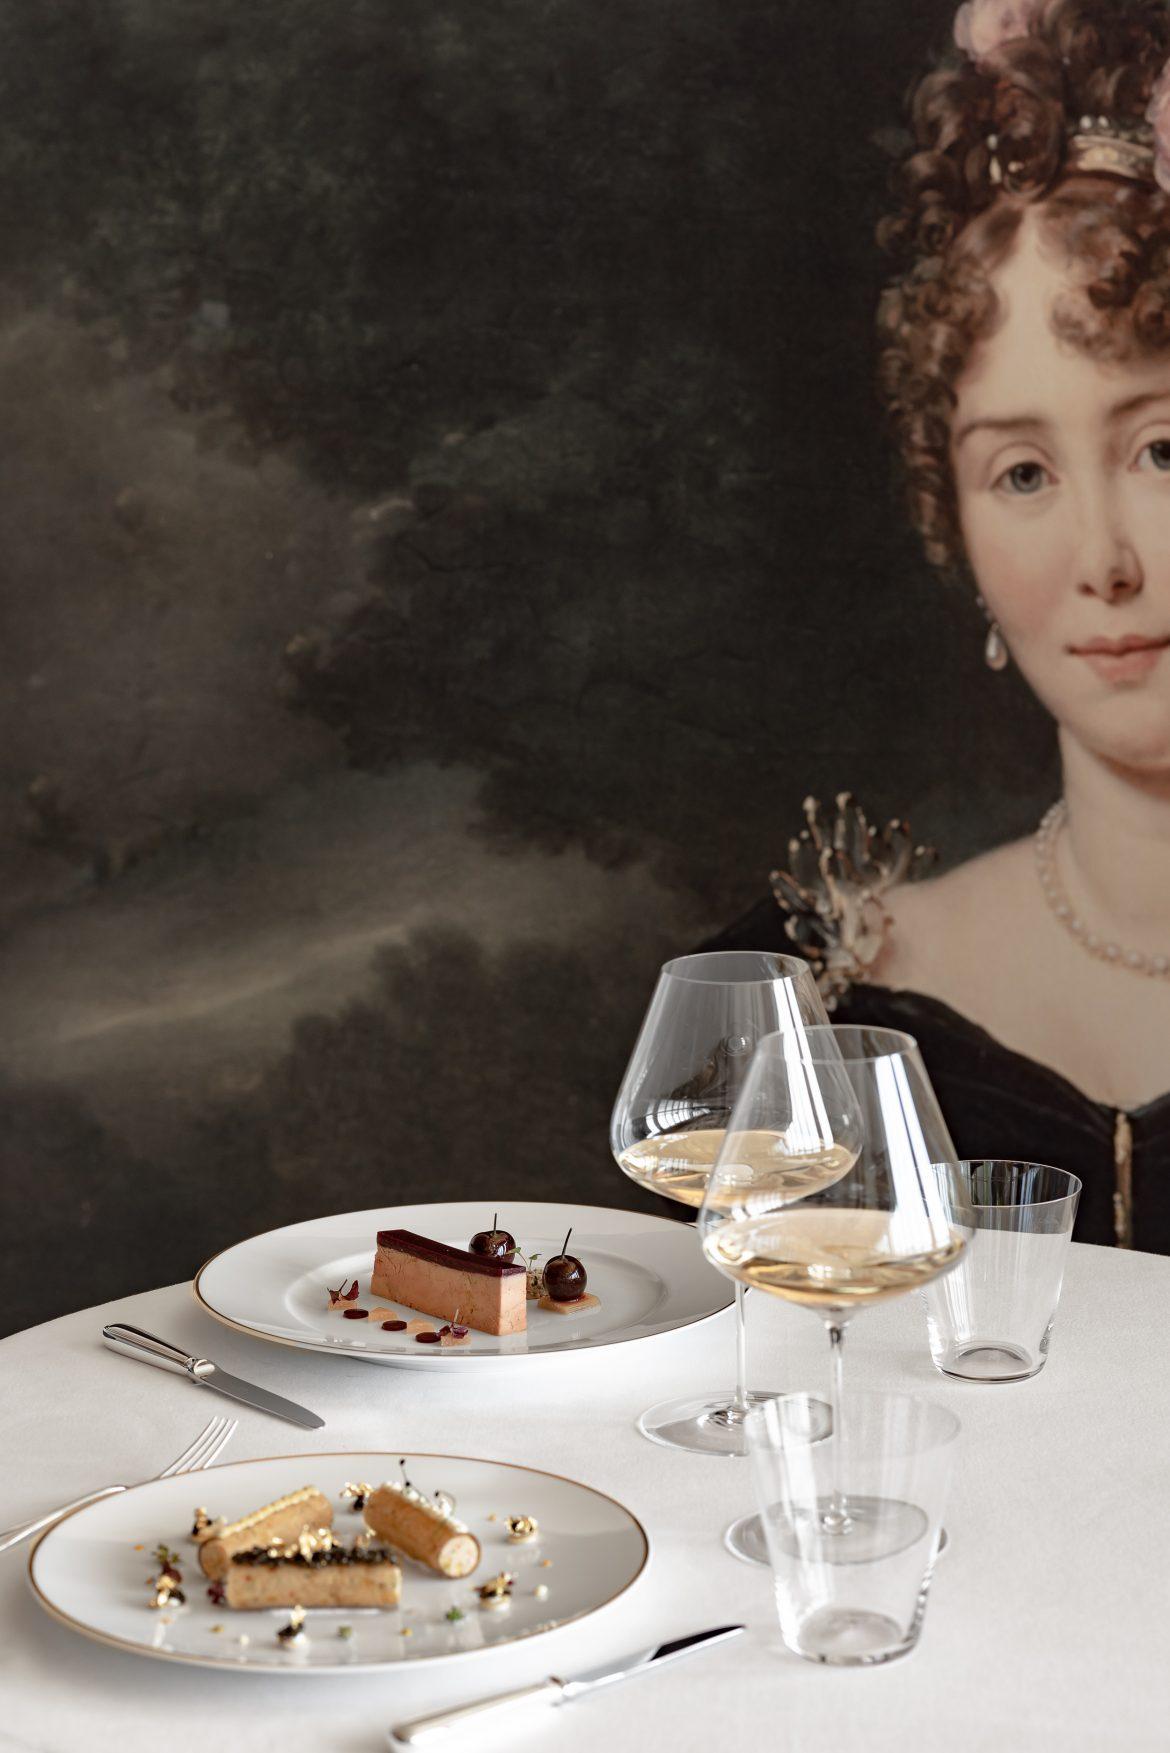 Royal Champagne : un ancien relais de poste de Napoléon reconverti en hôtel pétillant